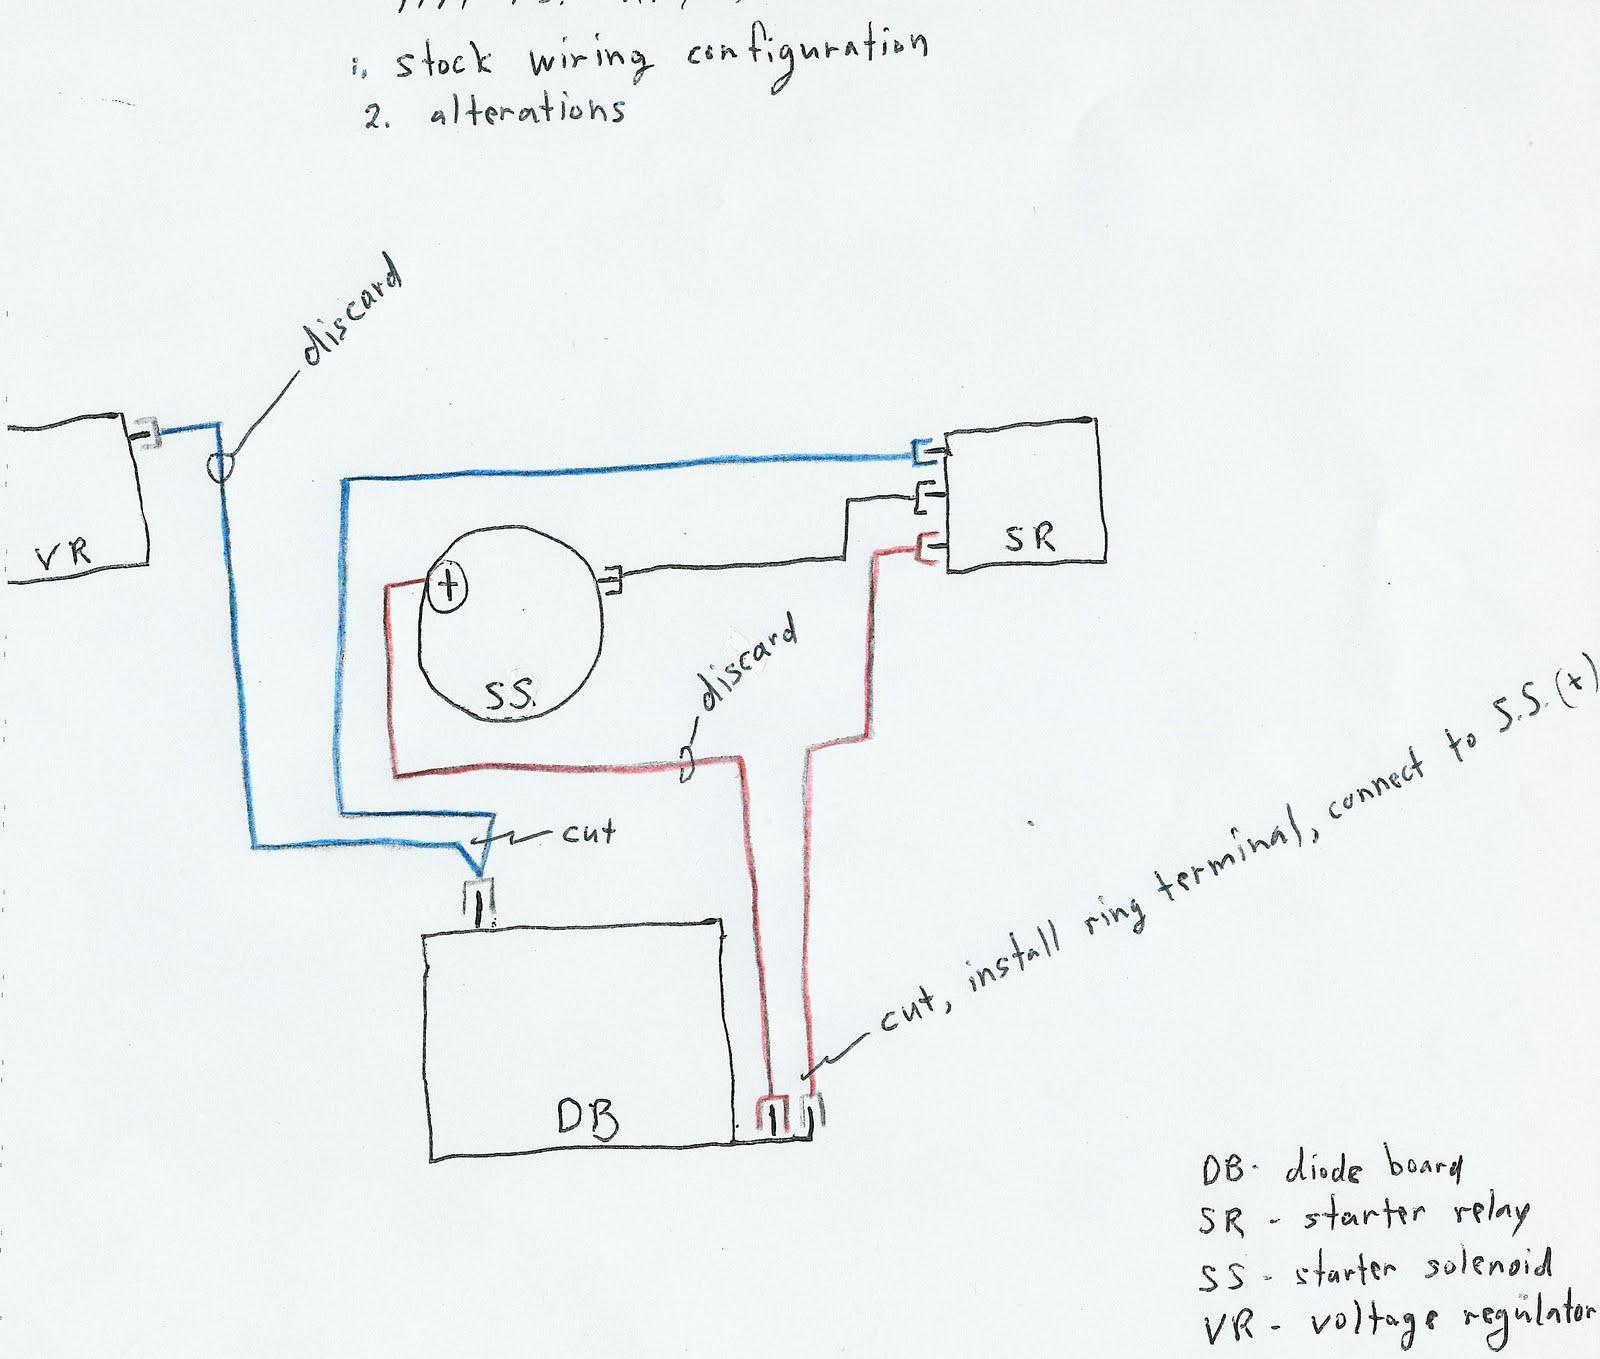 enduralast regulator mounting plate  enduralast wiring for the  u0026 39 75 r90s